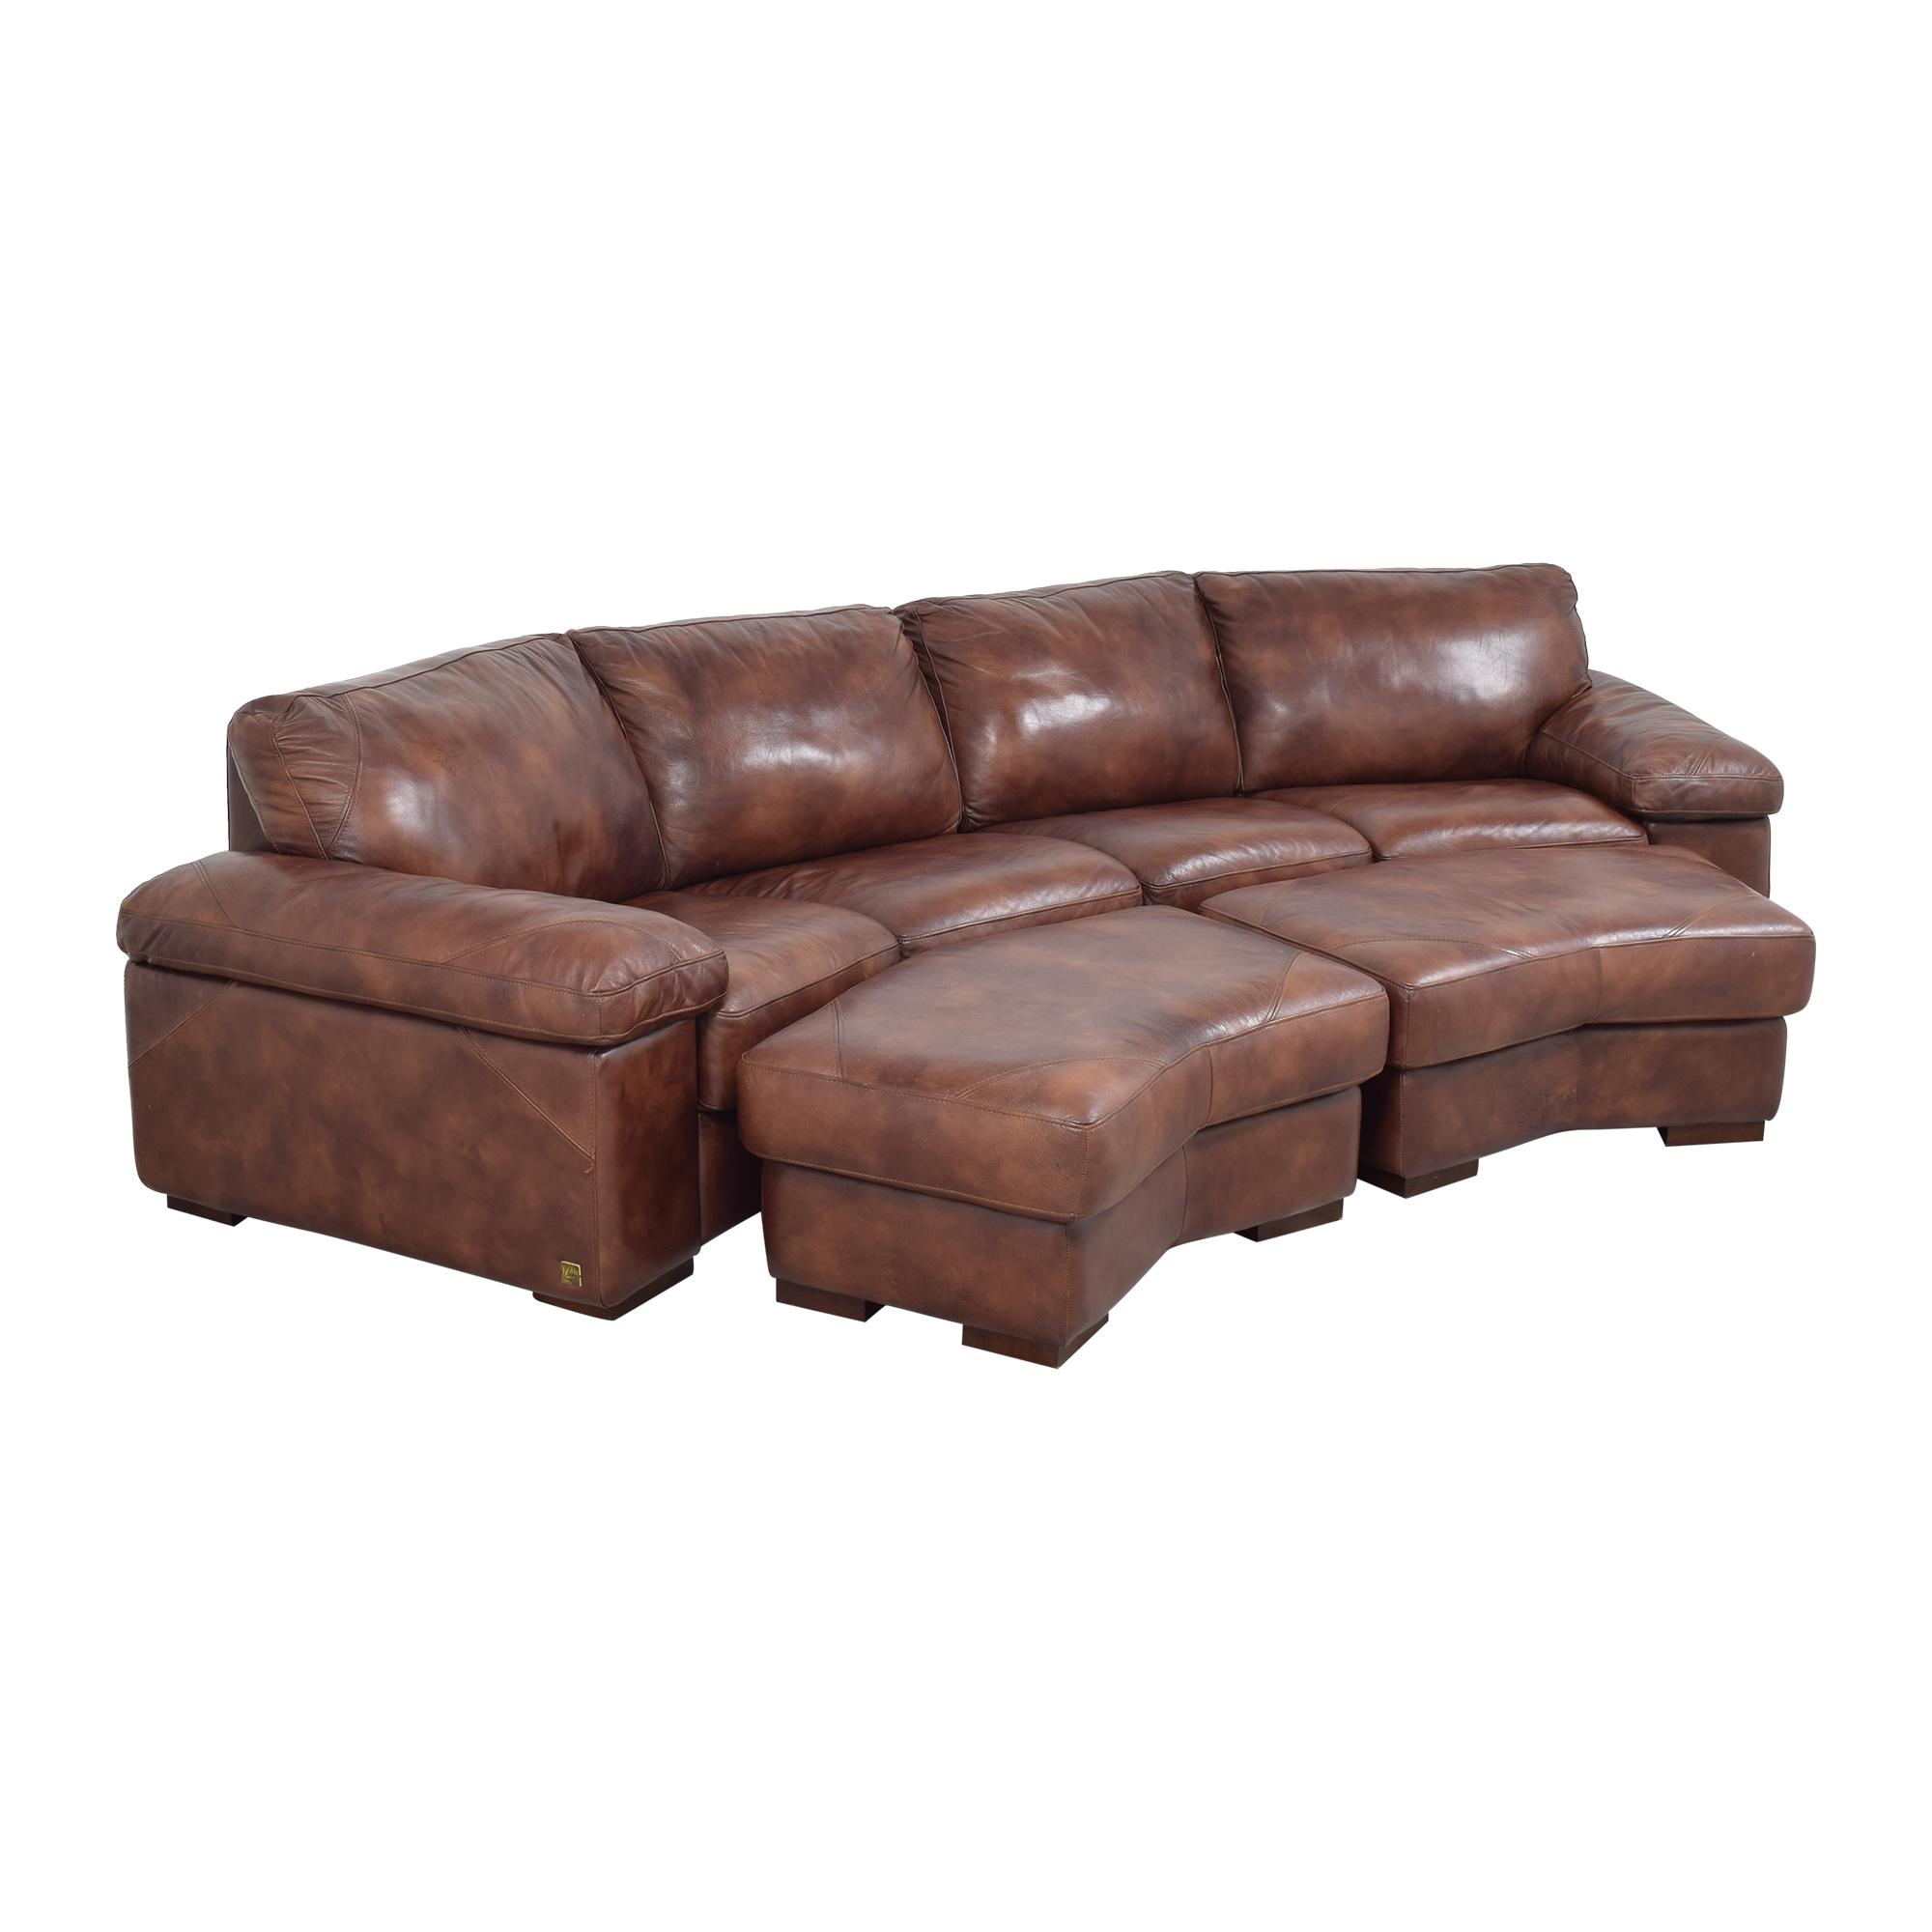 Bassett Furniture Bassett Two Piece Sectional Sofa with Ottomans nj